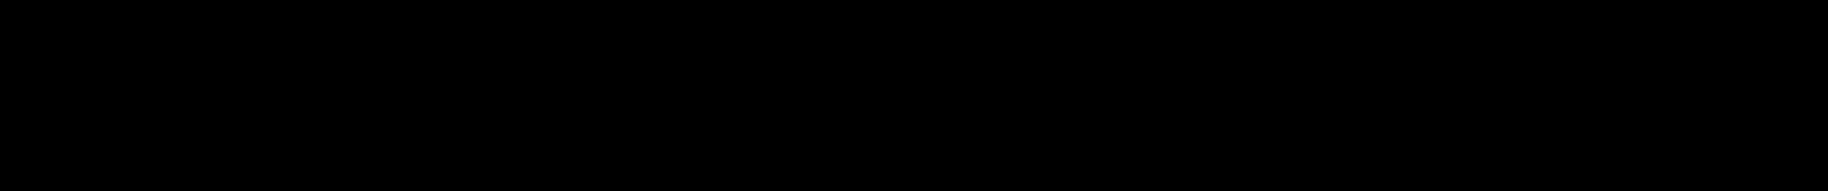 Sofachrome Regular